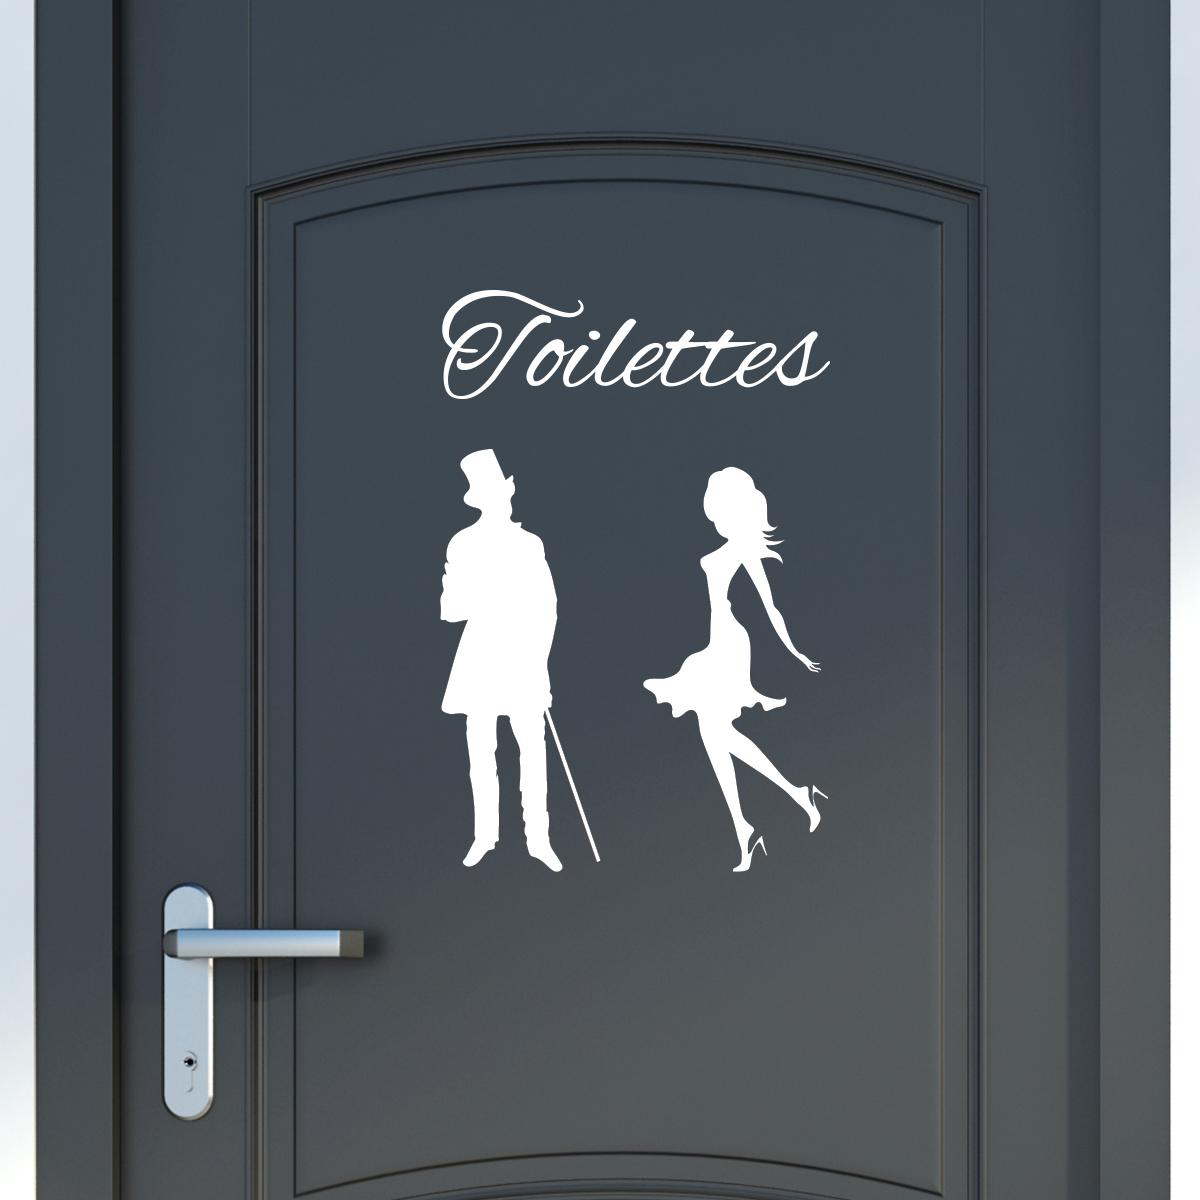 Sticker porte toilettes silhouettes homme et femme stickers toilettes porte ambiance sticker - Stickers porte wc ...